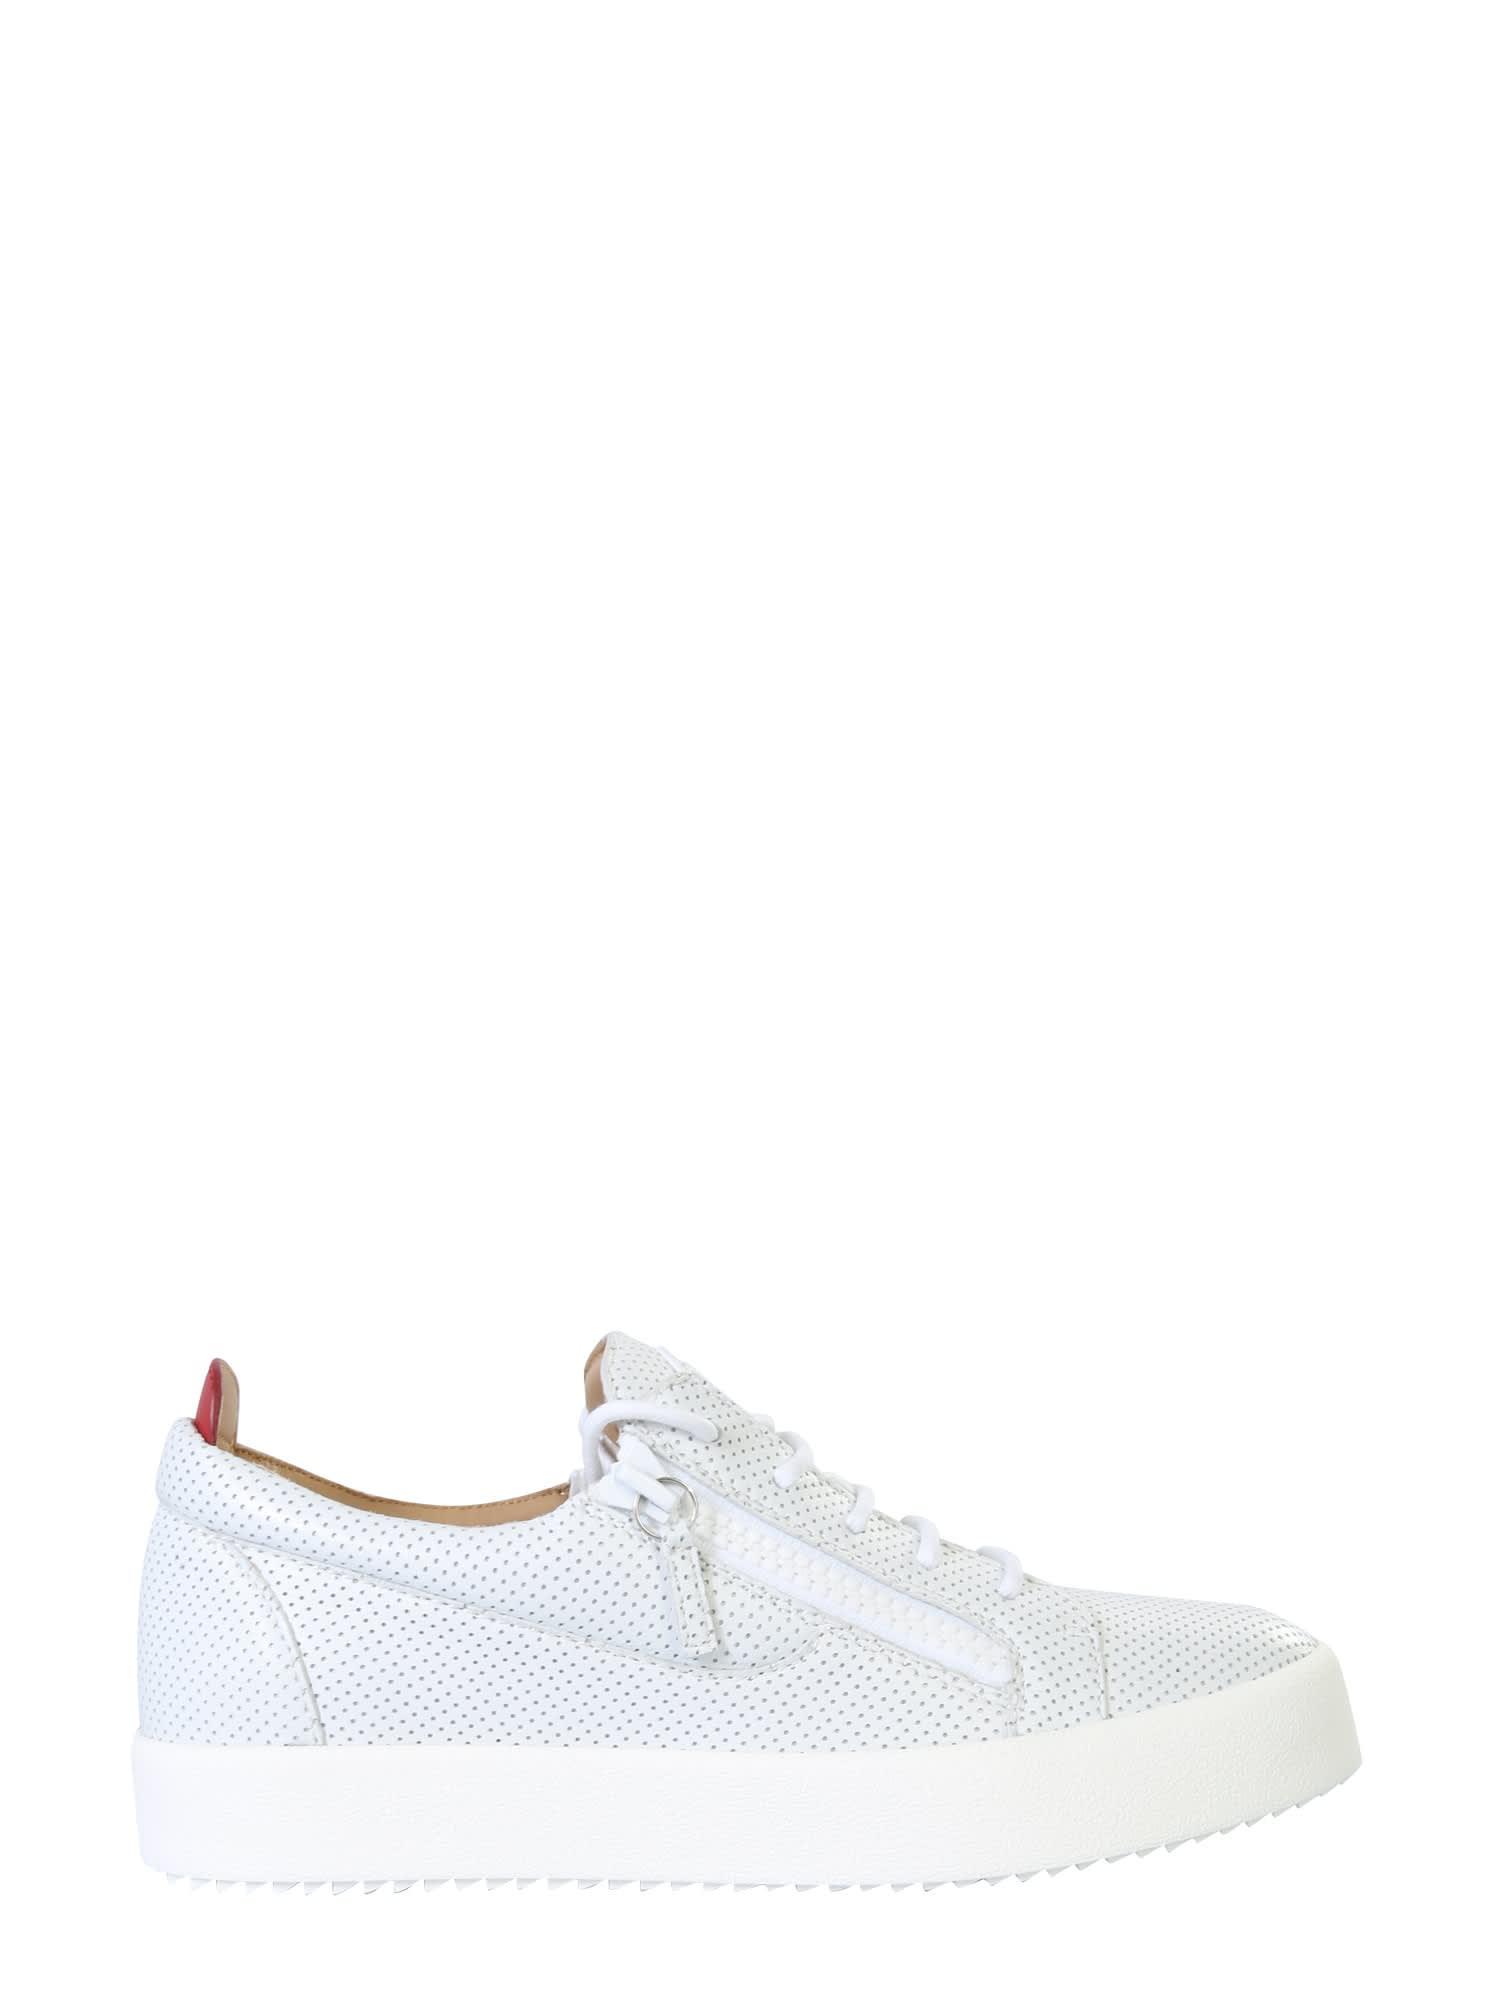 Giuseppe Zanotti Perforated Sneakers